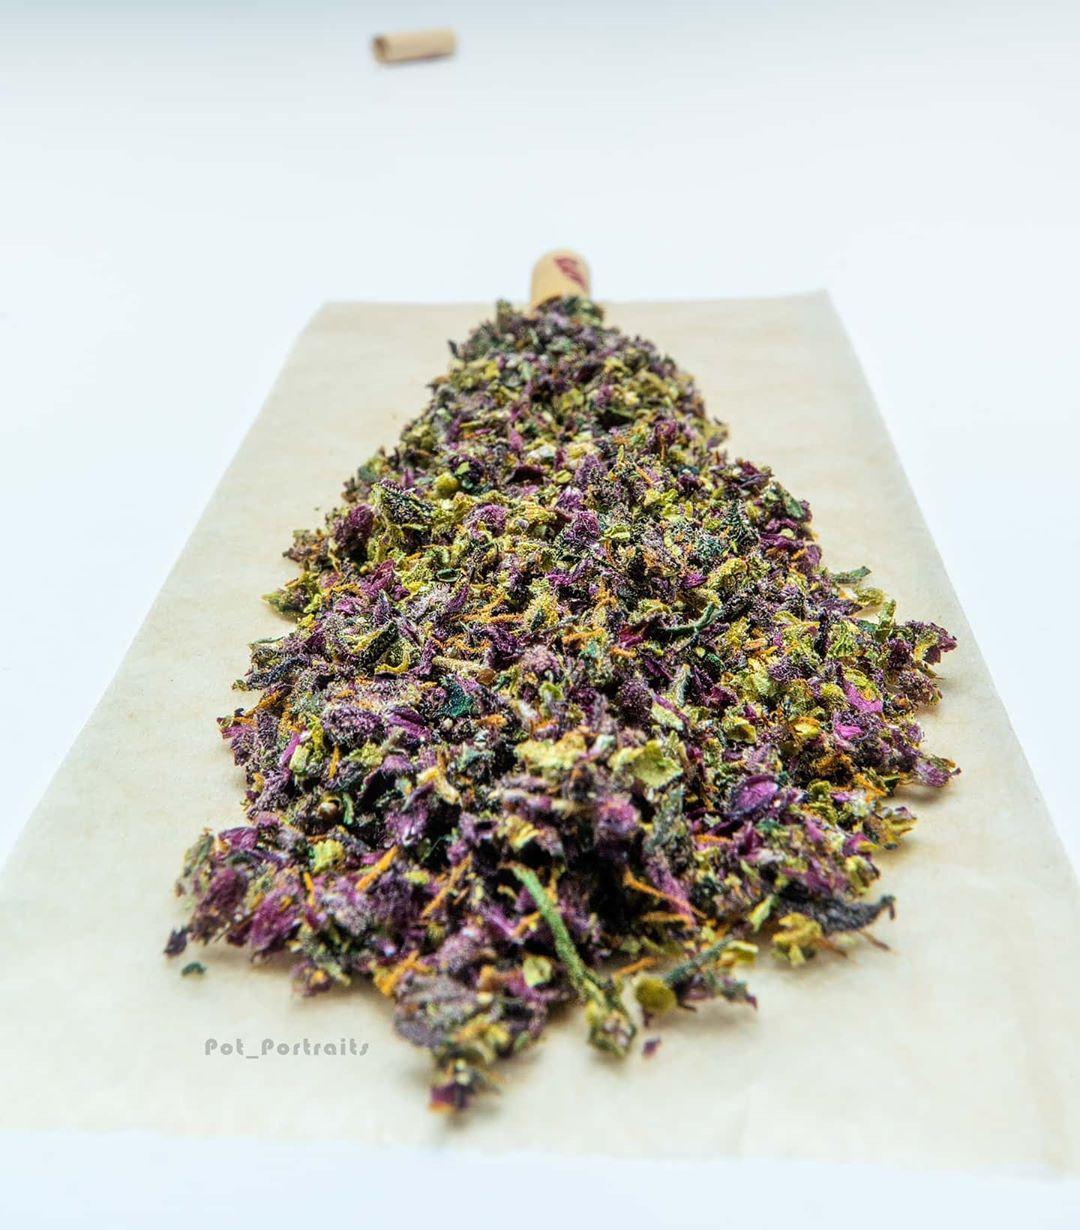 Purple Kush Buddha Seeds